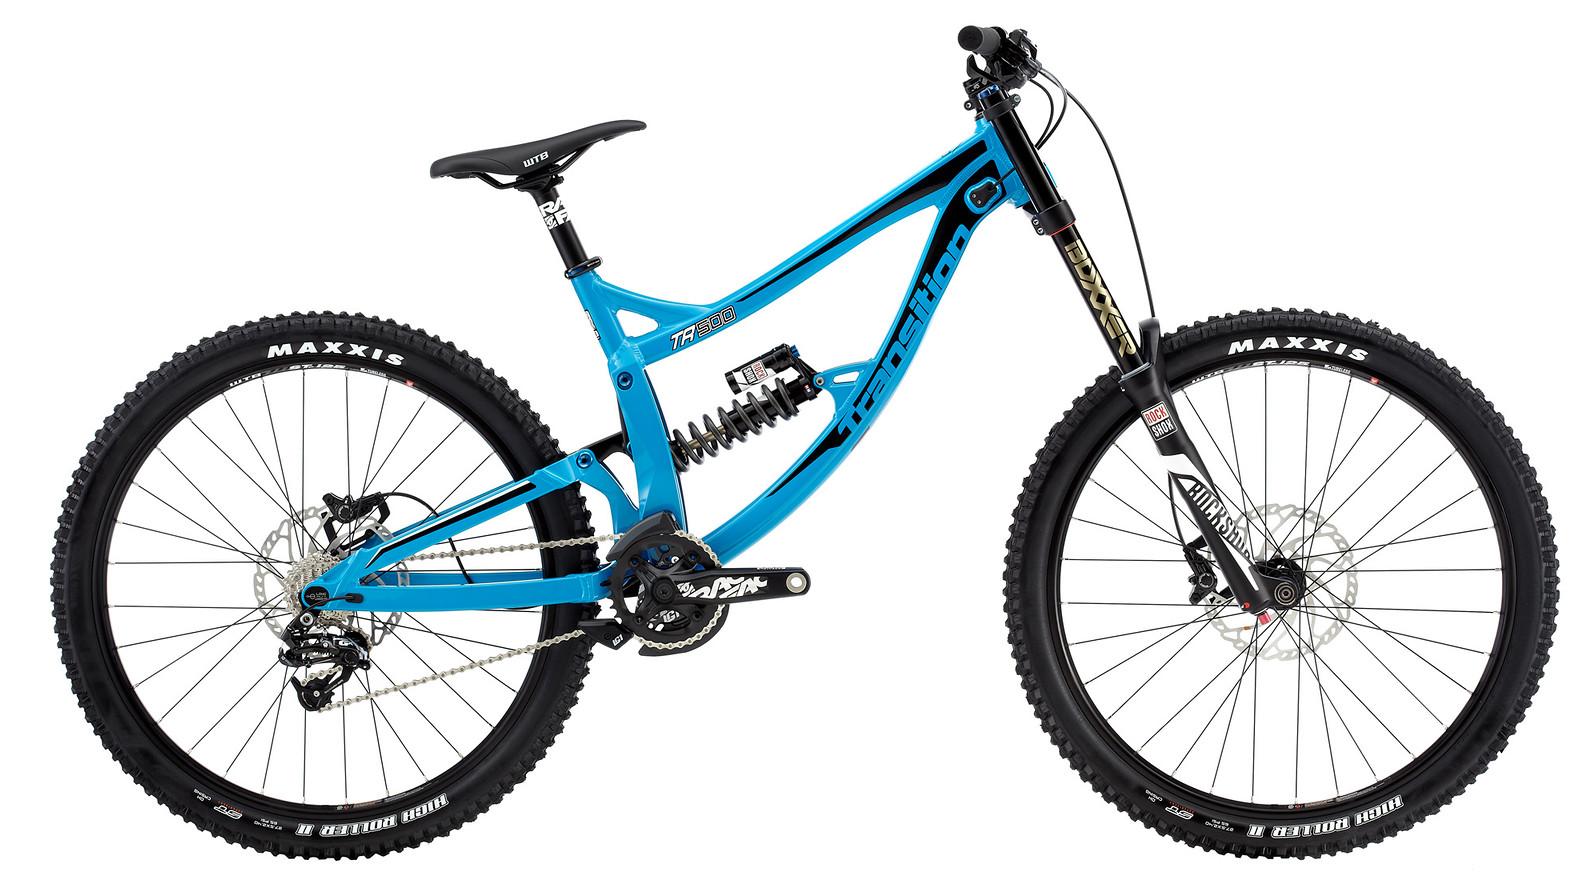 2017 Transition TR500 3 27.5 Bike